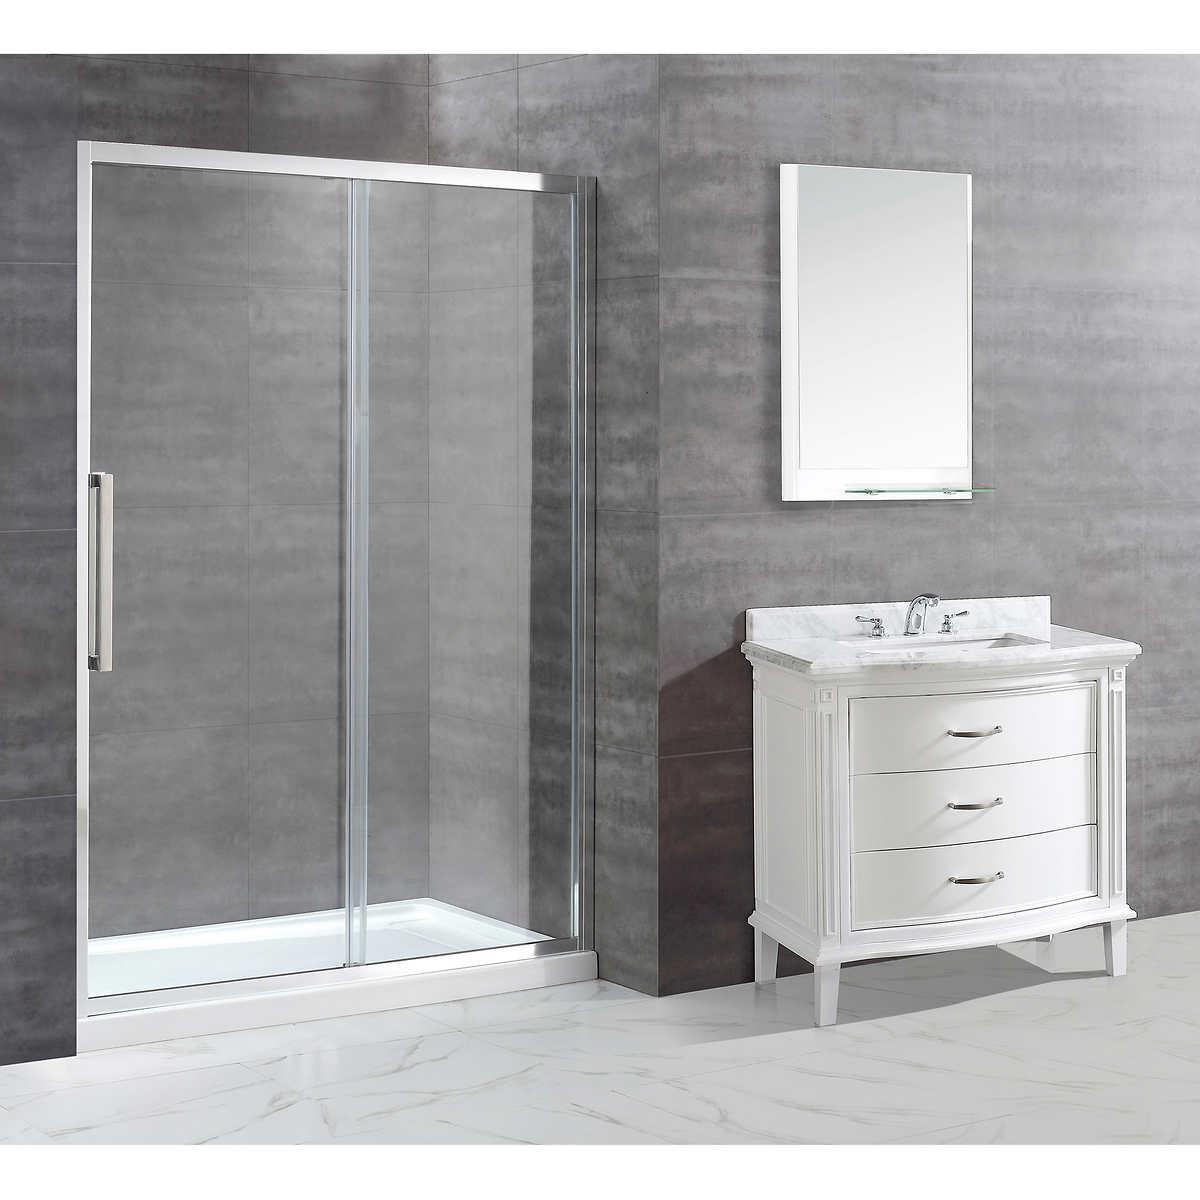 showers costco shower enclosure